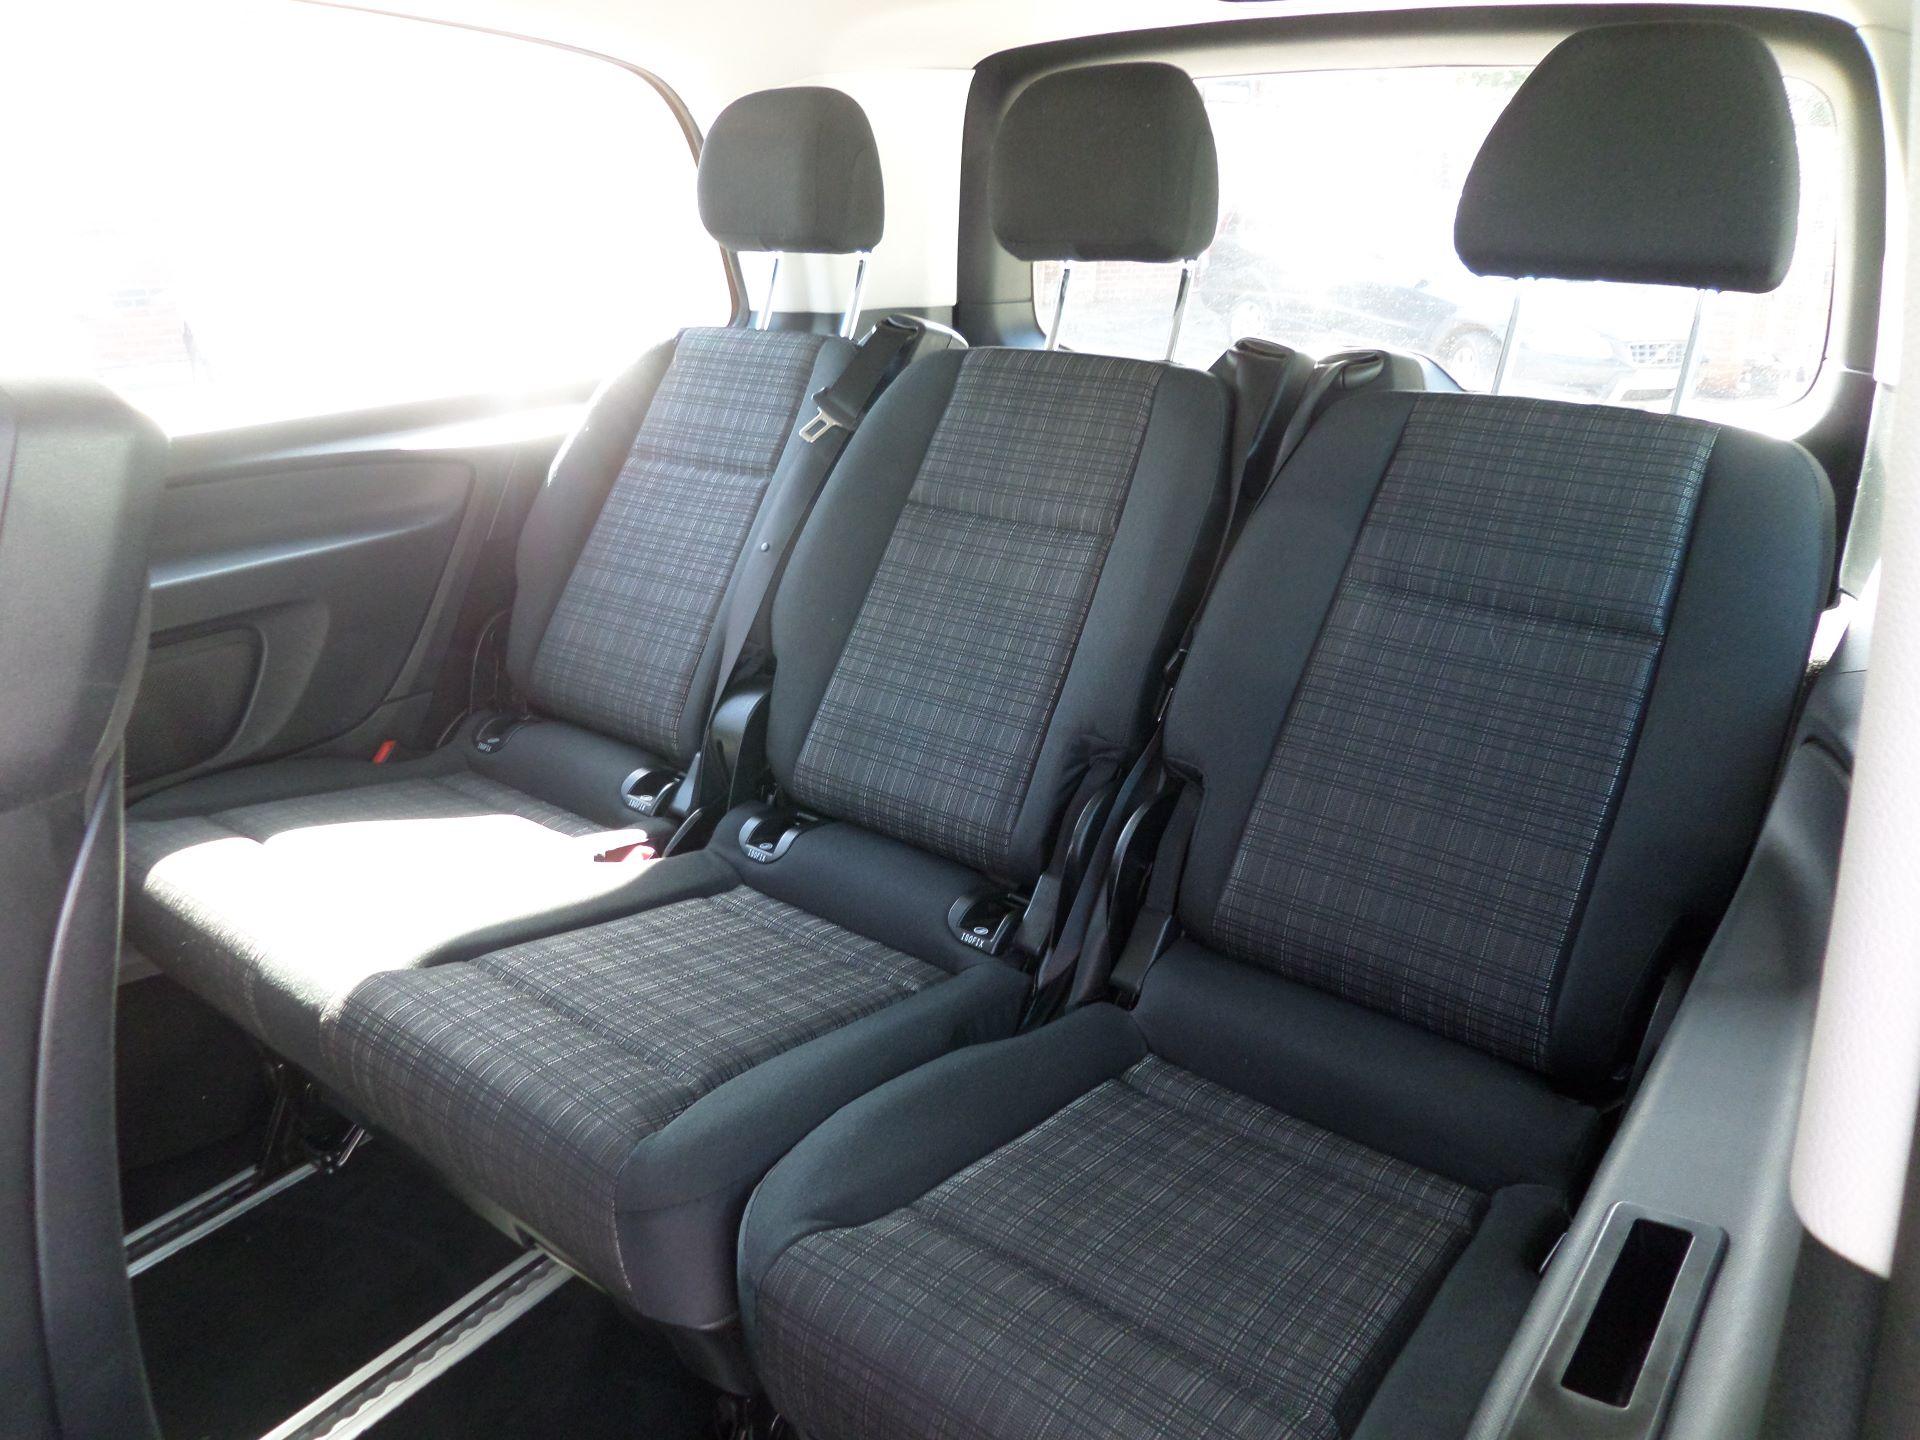 2019 Mercedes-Benz Vito 119 Bluetec Select 9-Seater 7G-Tronic Euro 6 (KR19XWW) Image 9